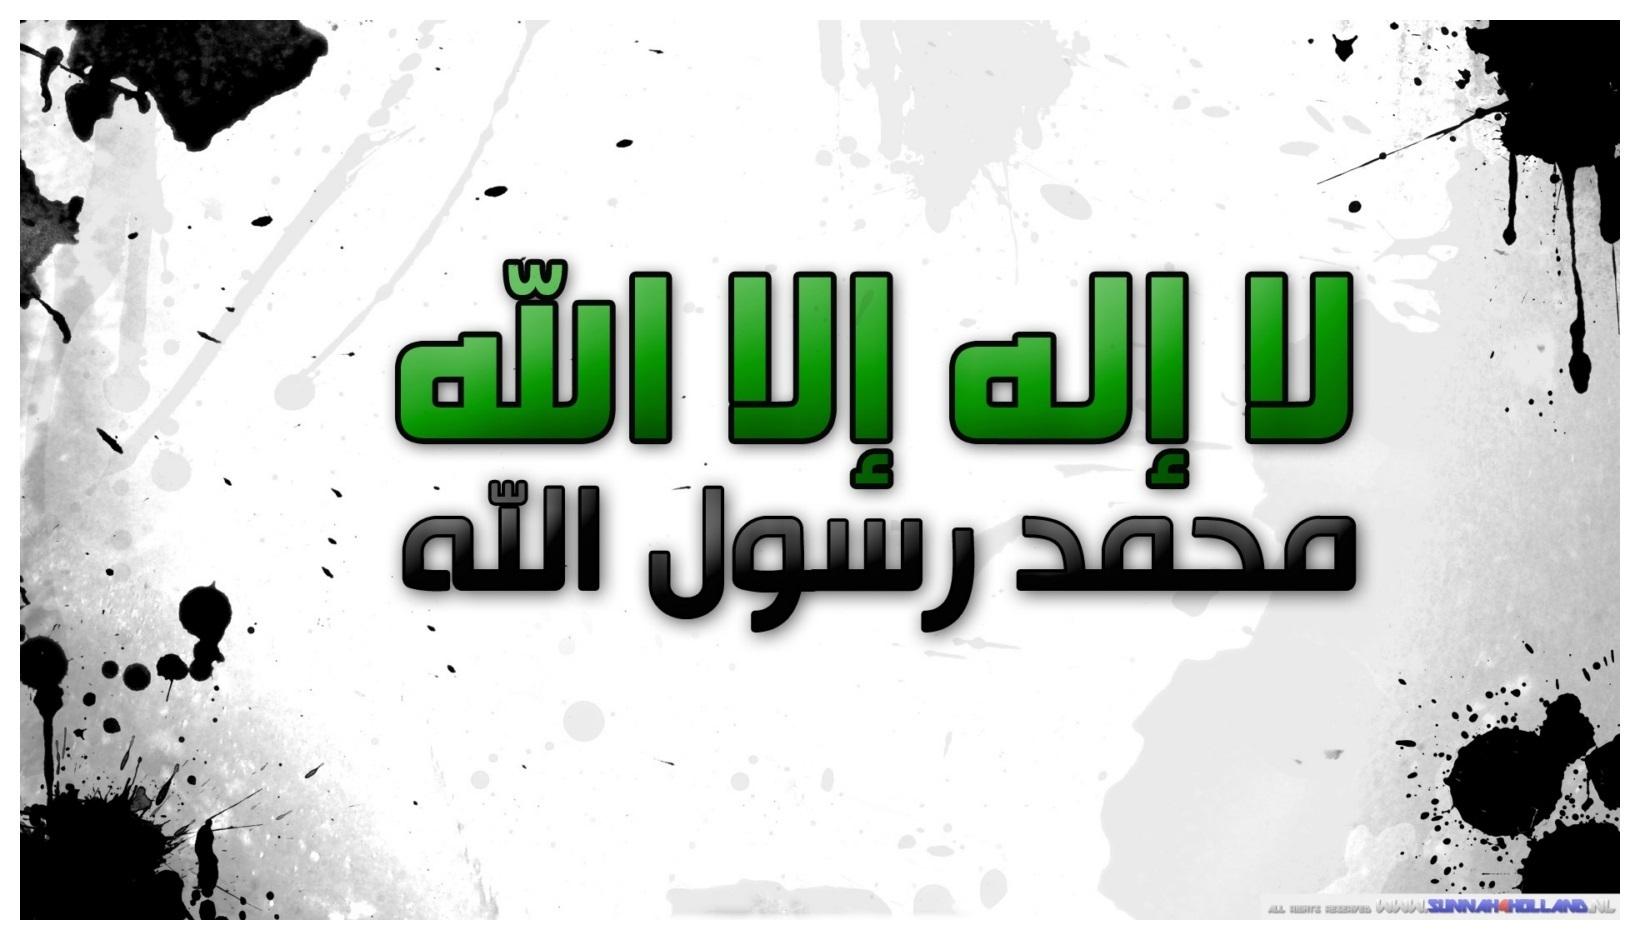 Best Hd Car Wallpaper Download La Ilaha Illallah Muhammad Rasool Allah Hd Wallpapers Hd